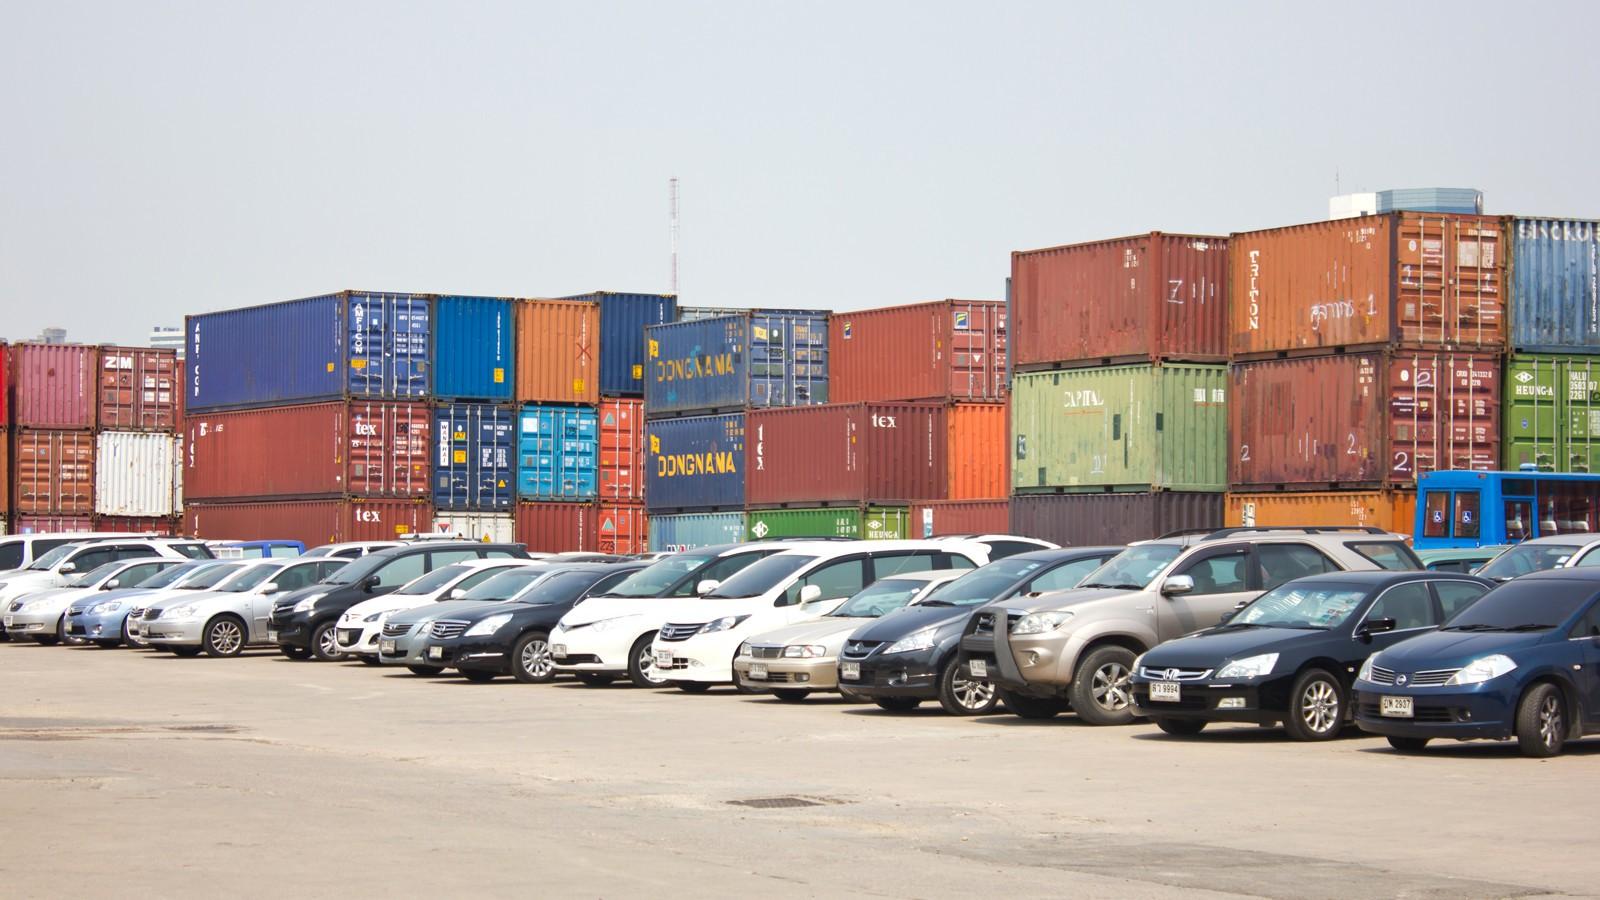 BANGKOK — MARCH 6 : Many cars park at Klong Toey port on March 6